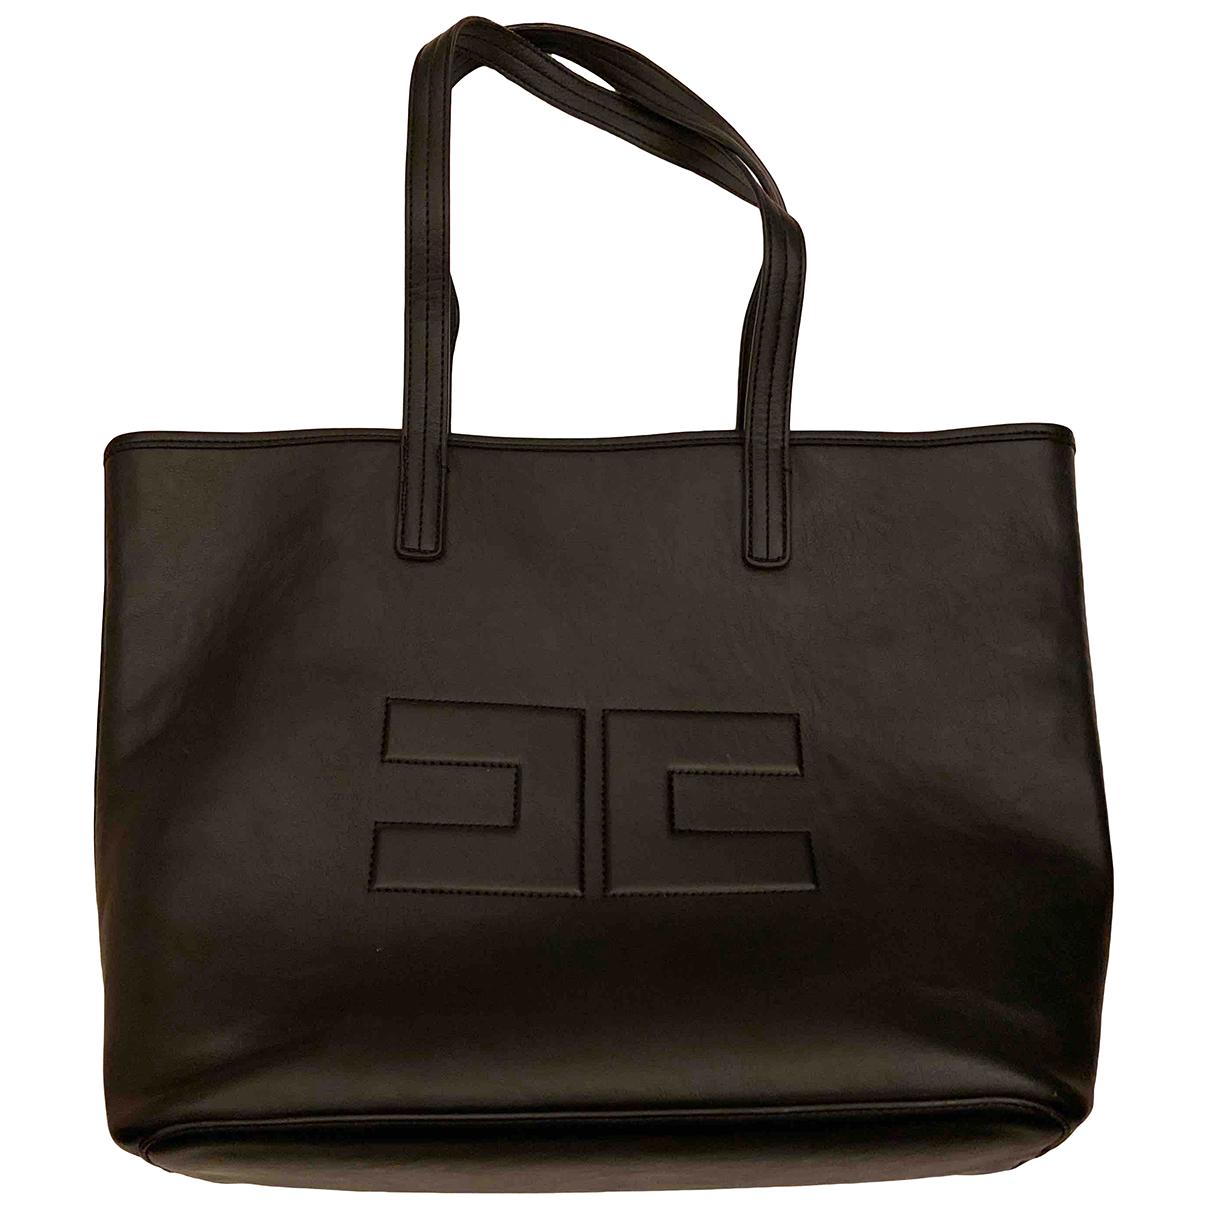 Elisabetta Franchi N Black handbag for Women N